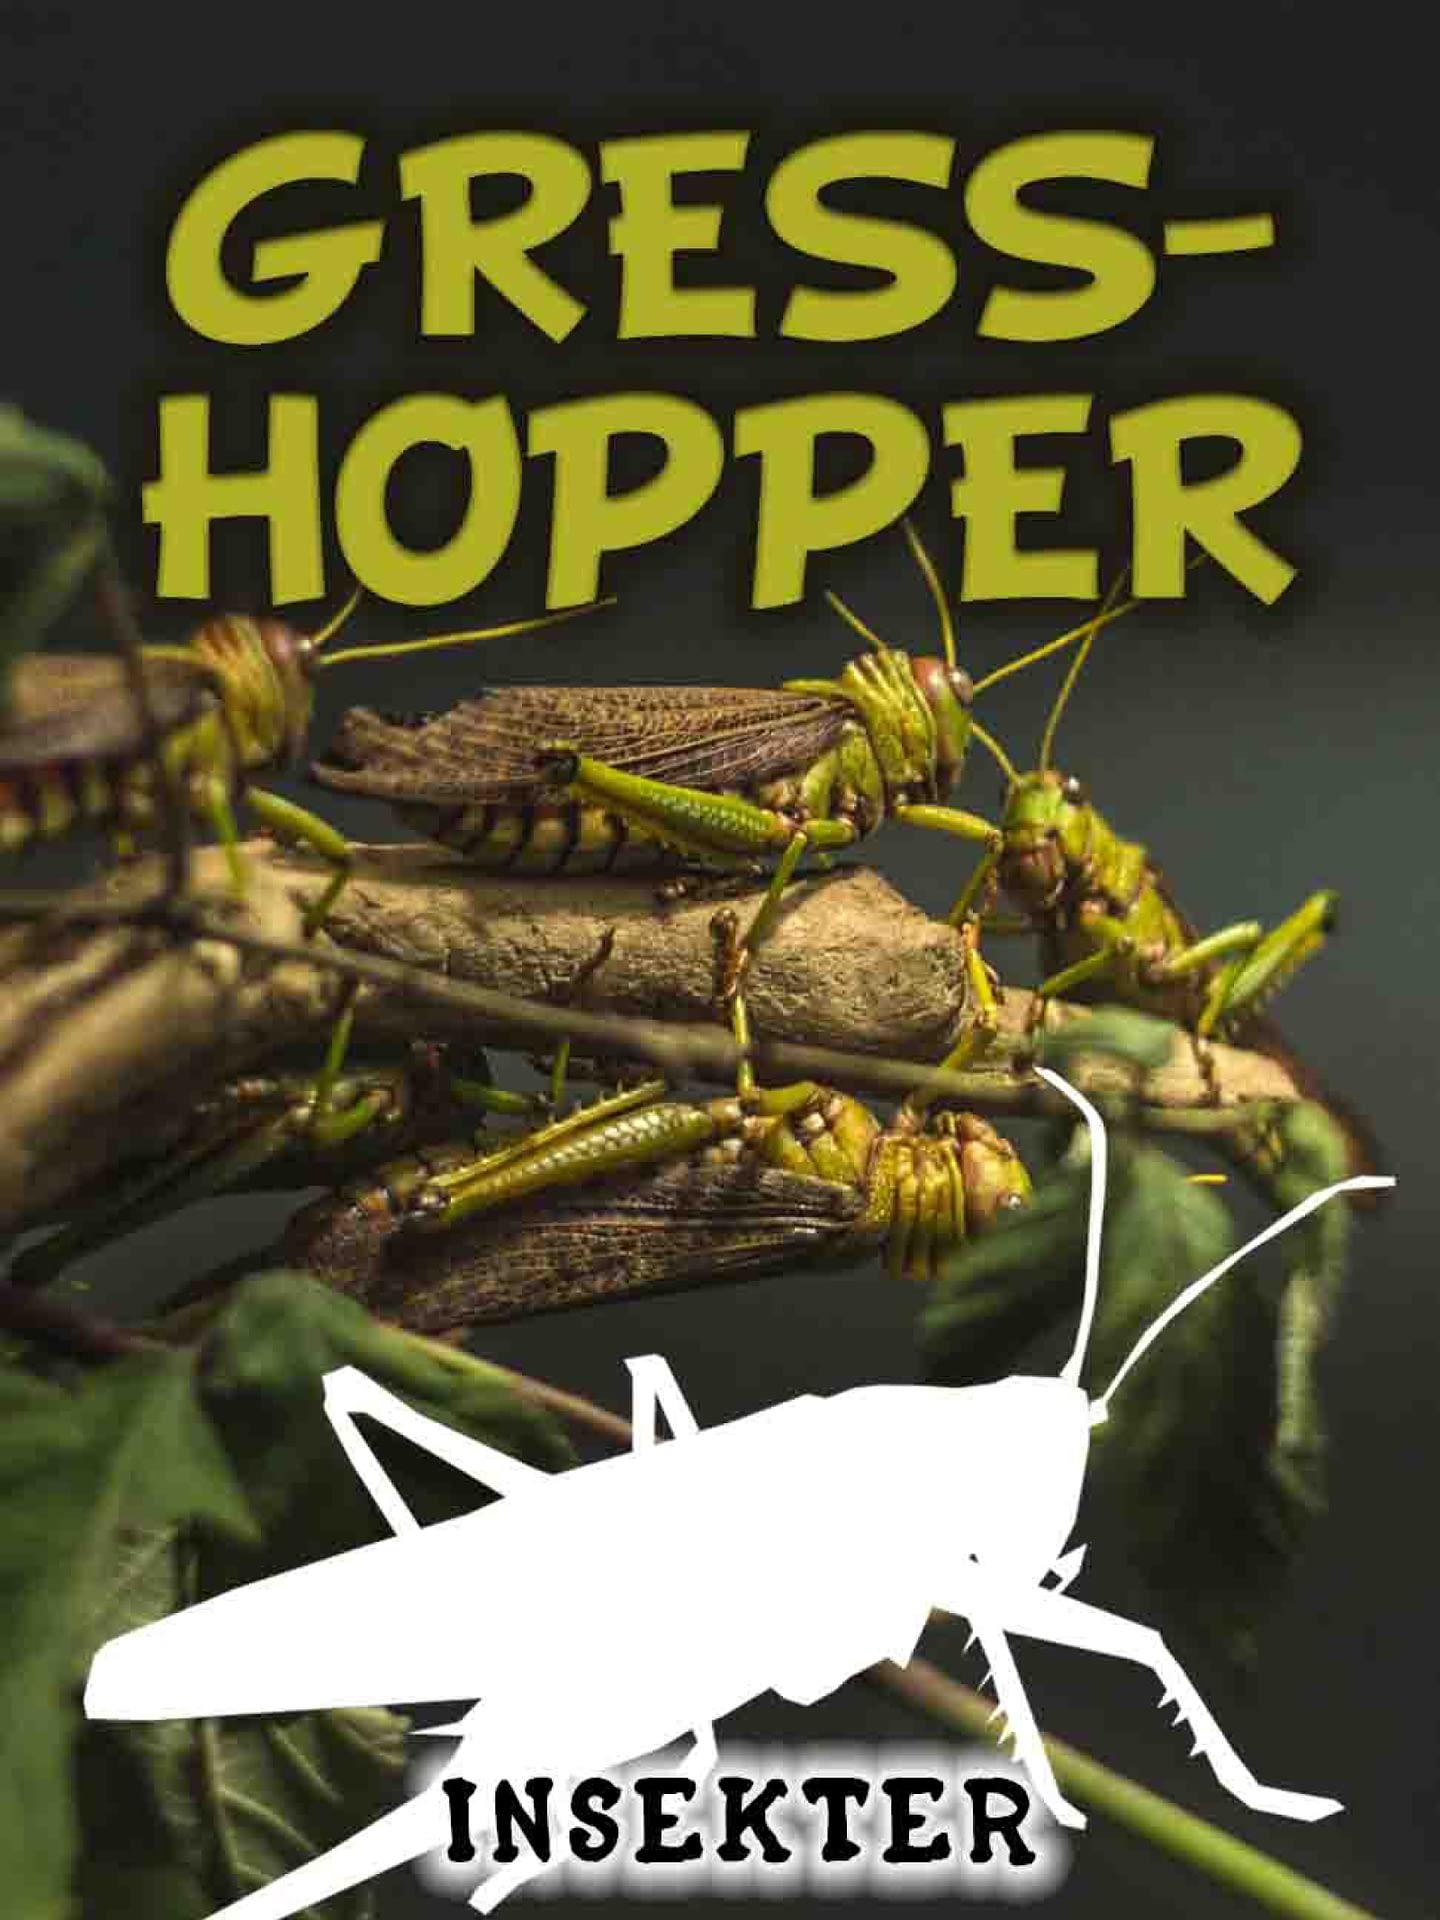 Gresshopper